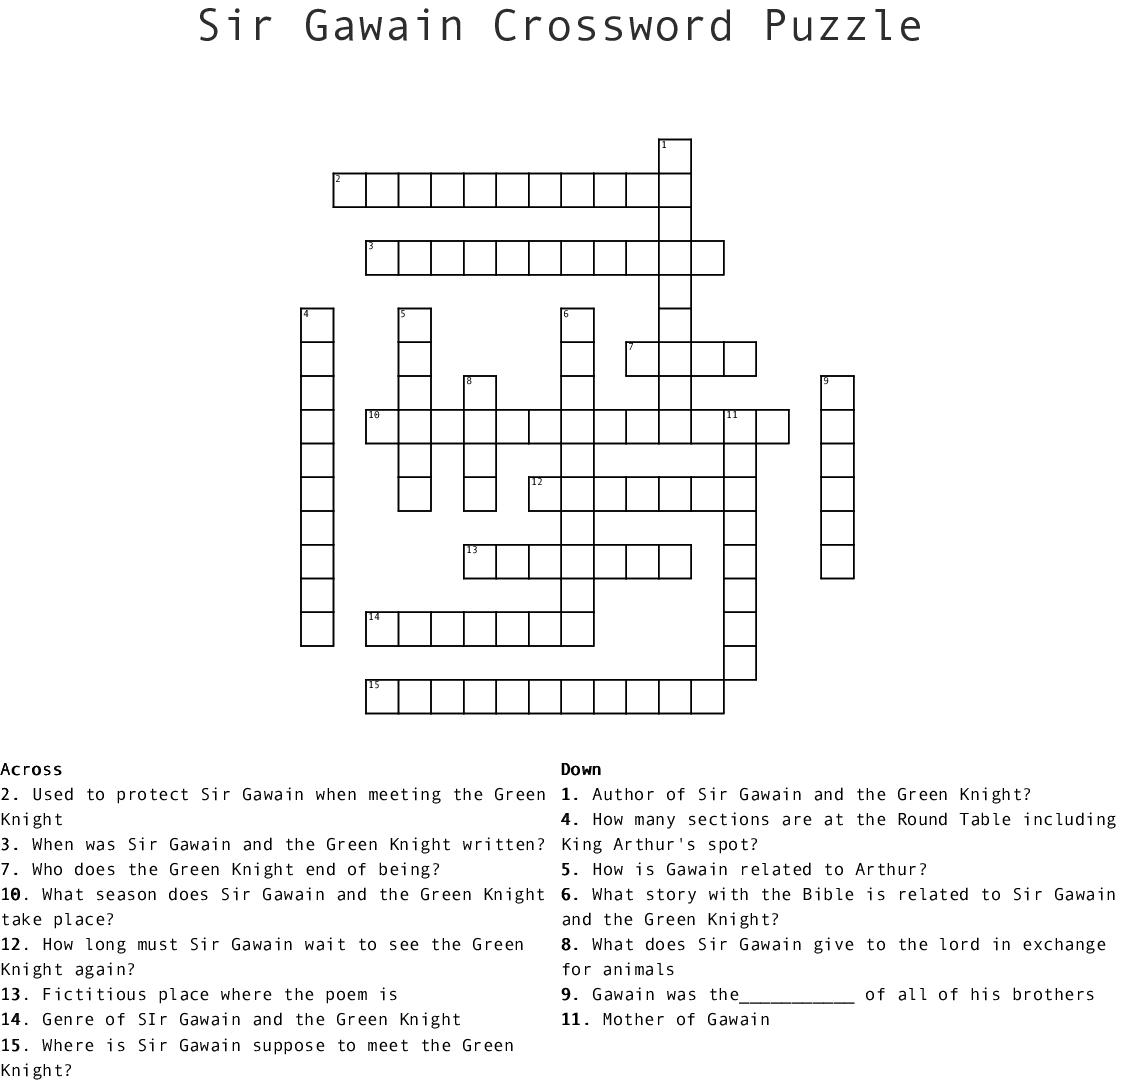 Sir Gawain Crossword Puzzle Crossword